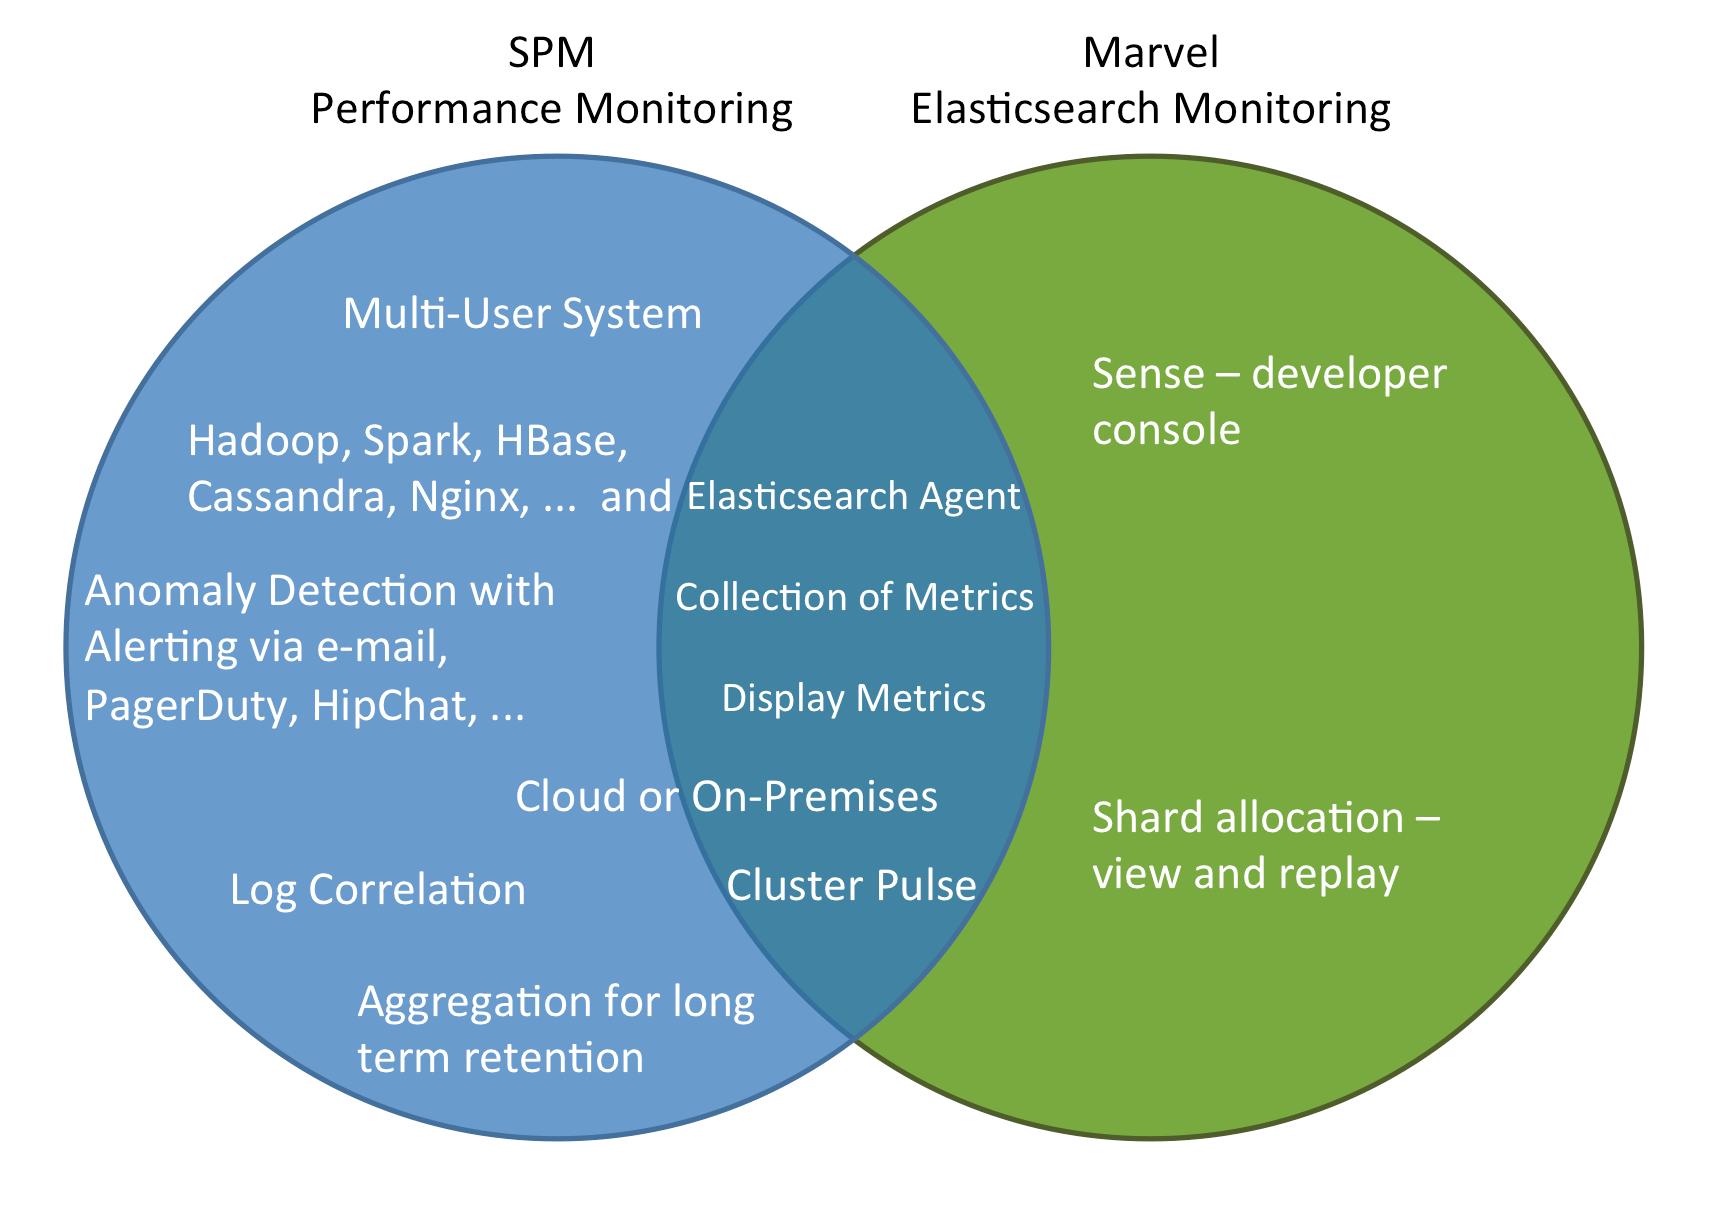 Elasticsearch Monitoring Spm Vs Marvel